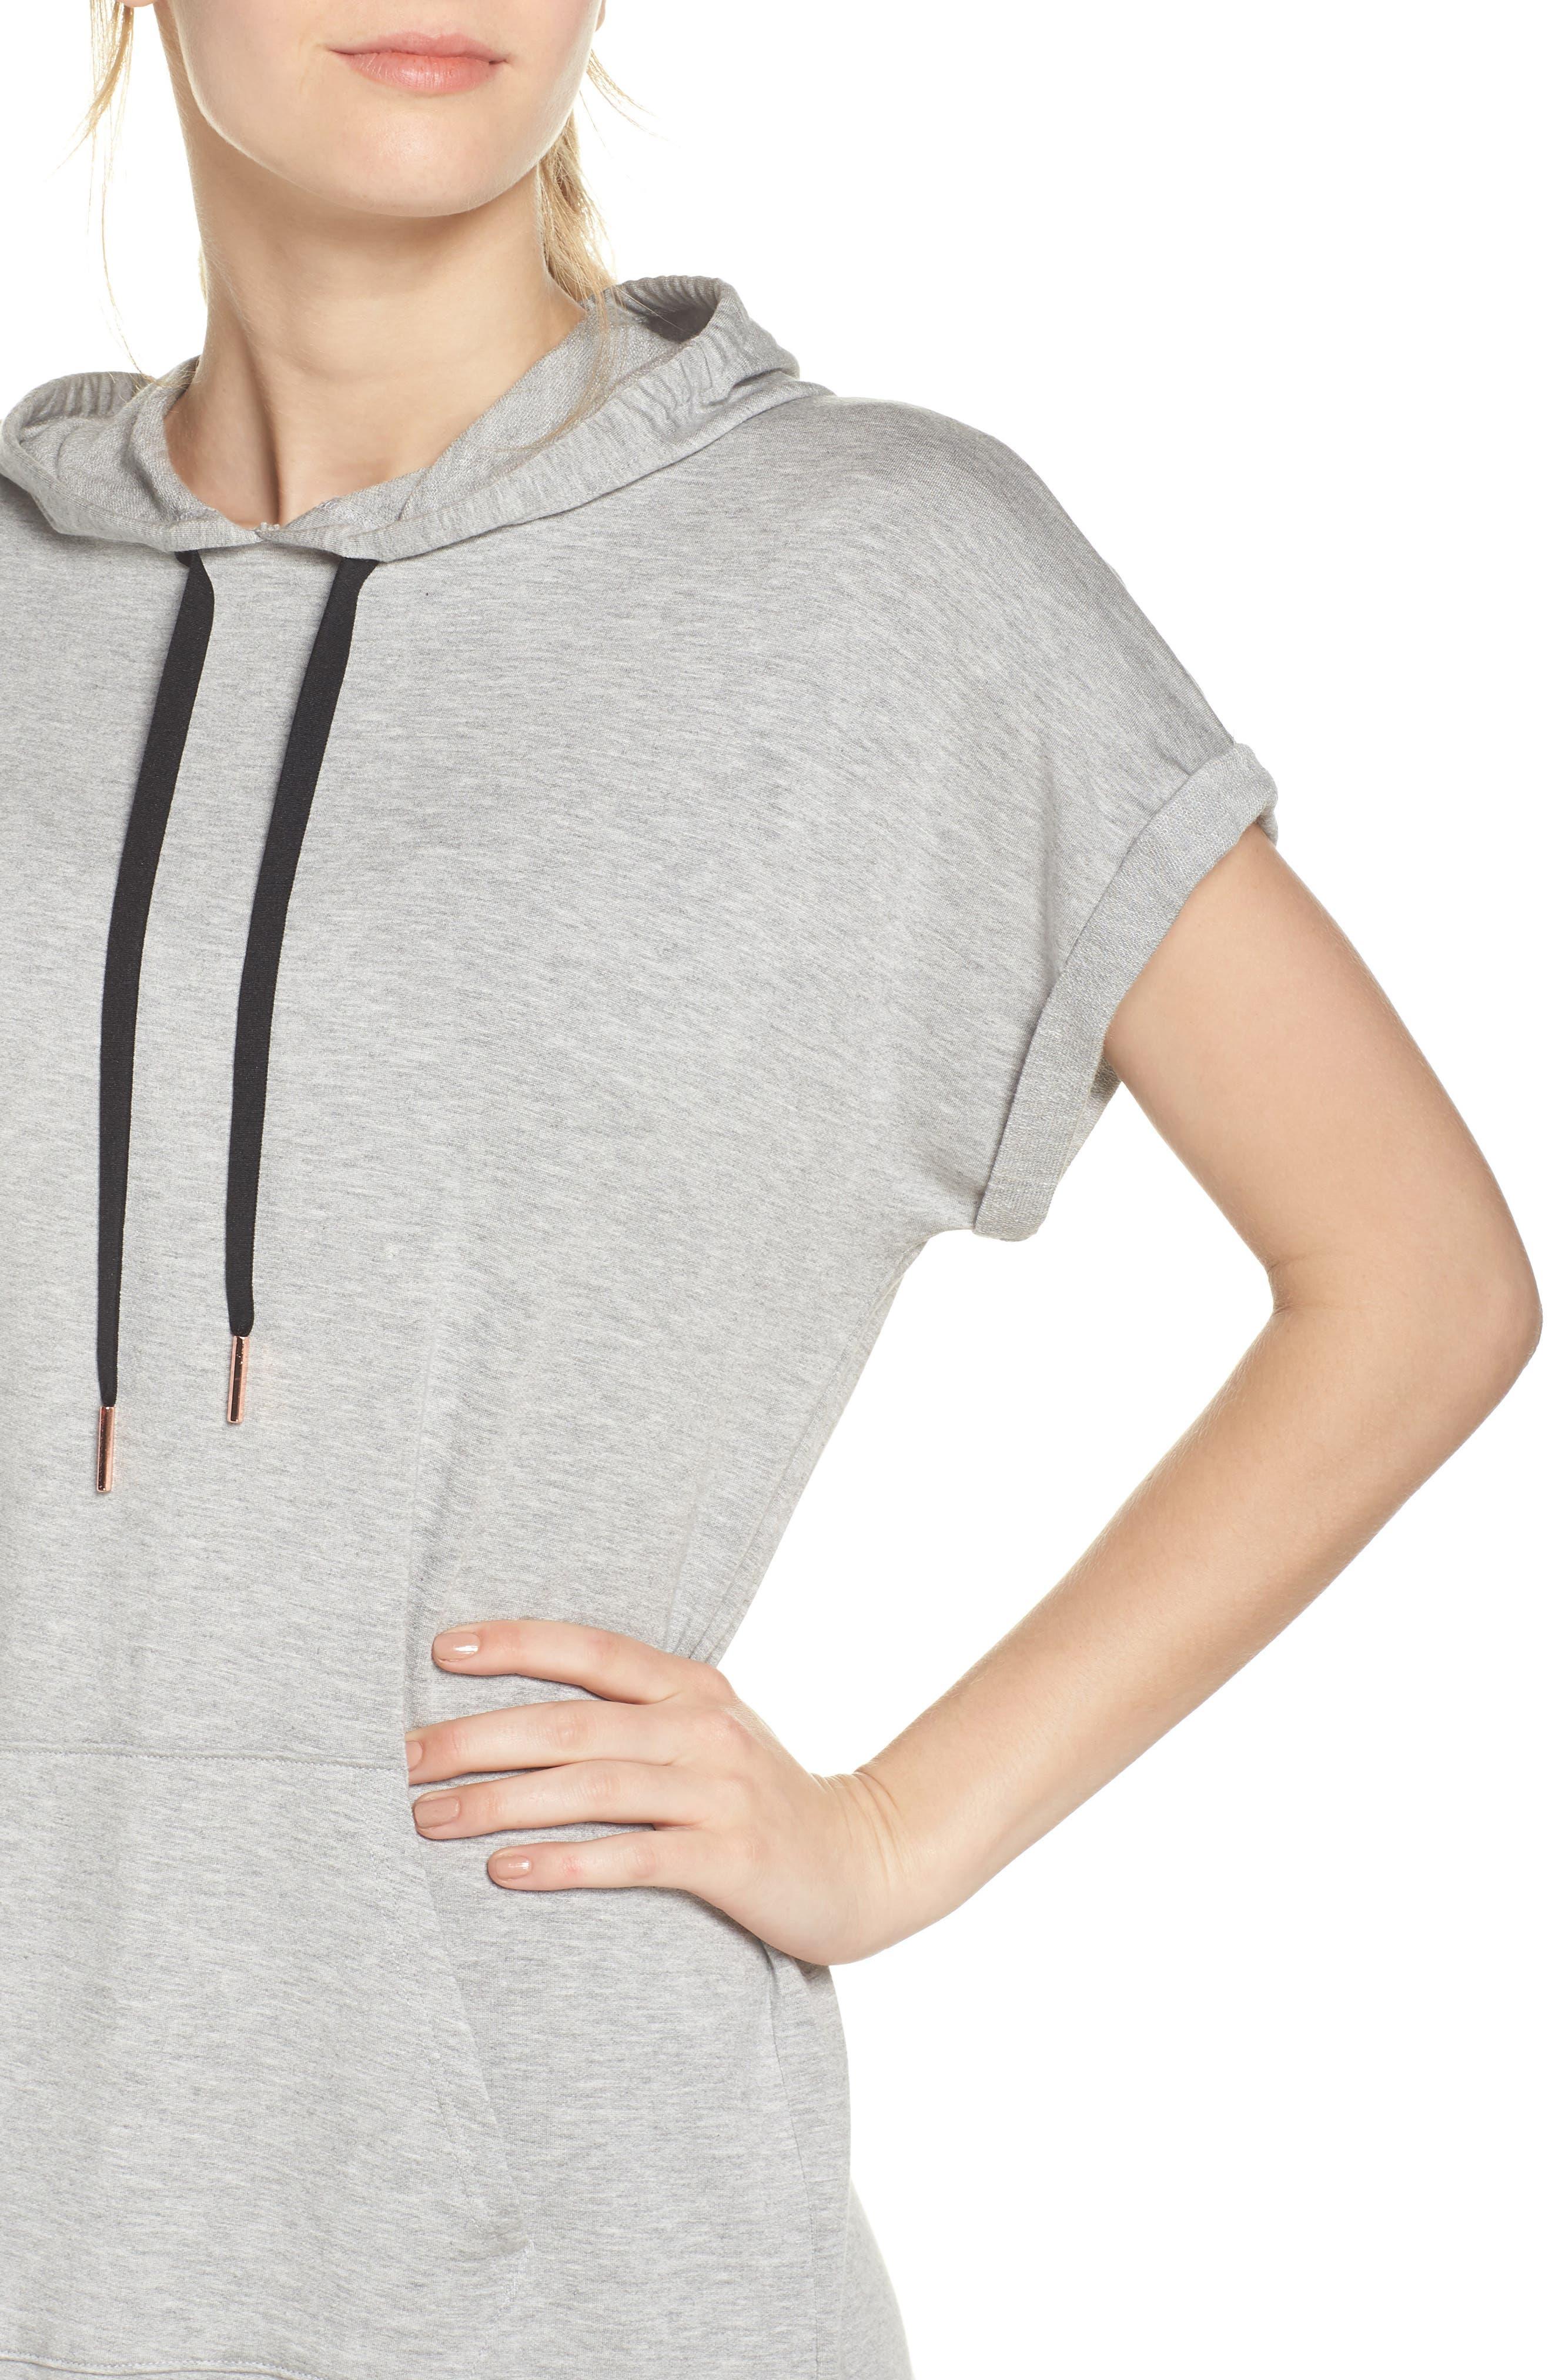 It's All Hoodie Hooded Sweatshirt Dress,                             Alternate thumbnail 4, color,                             LIGHT HEATHER GRAY